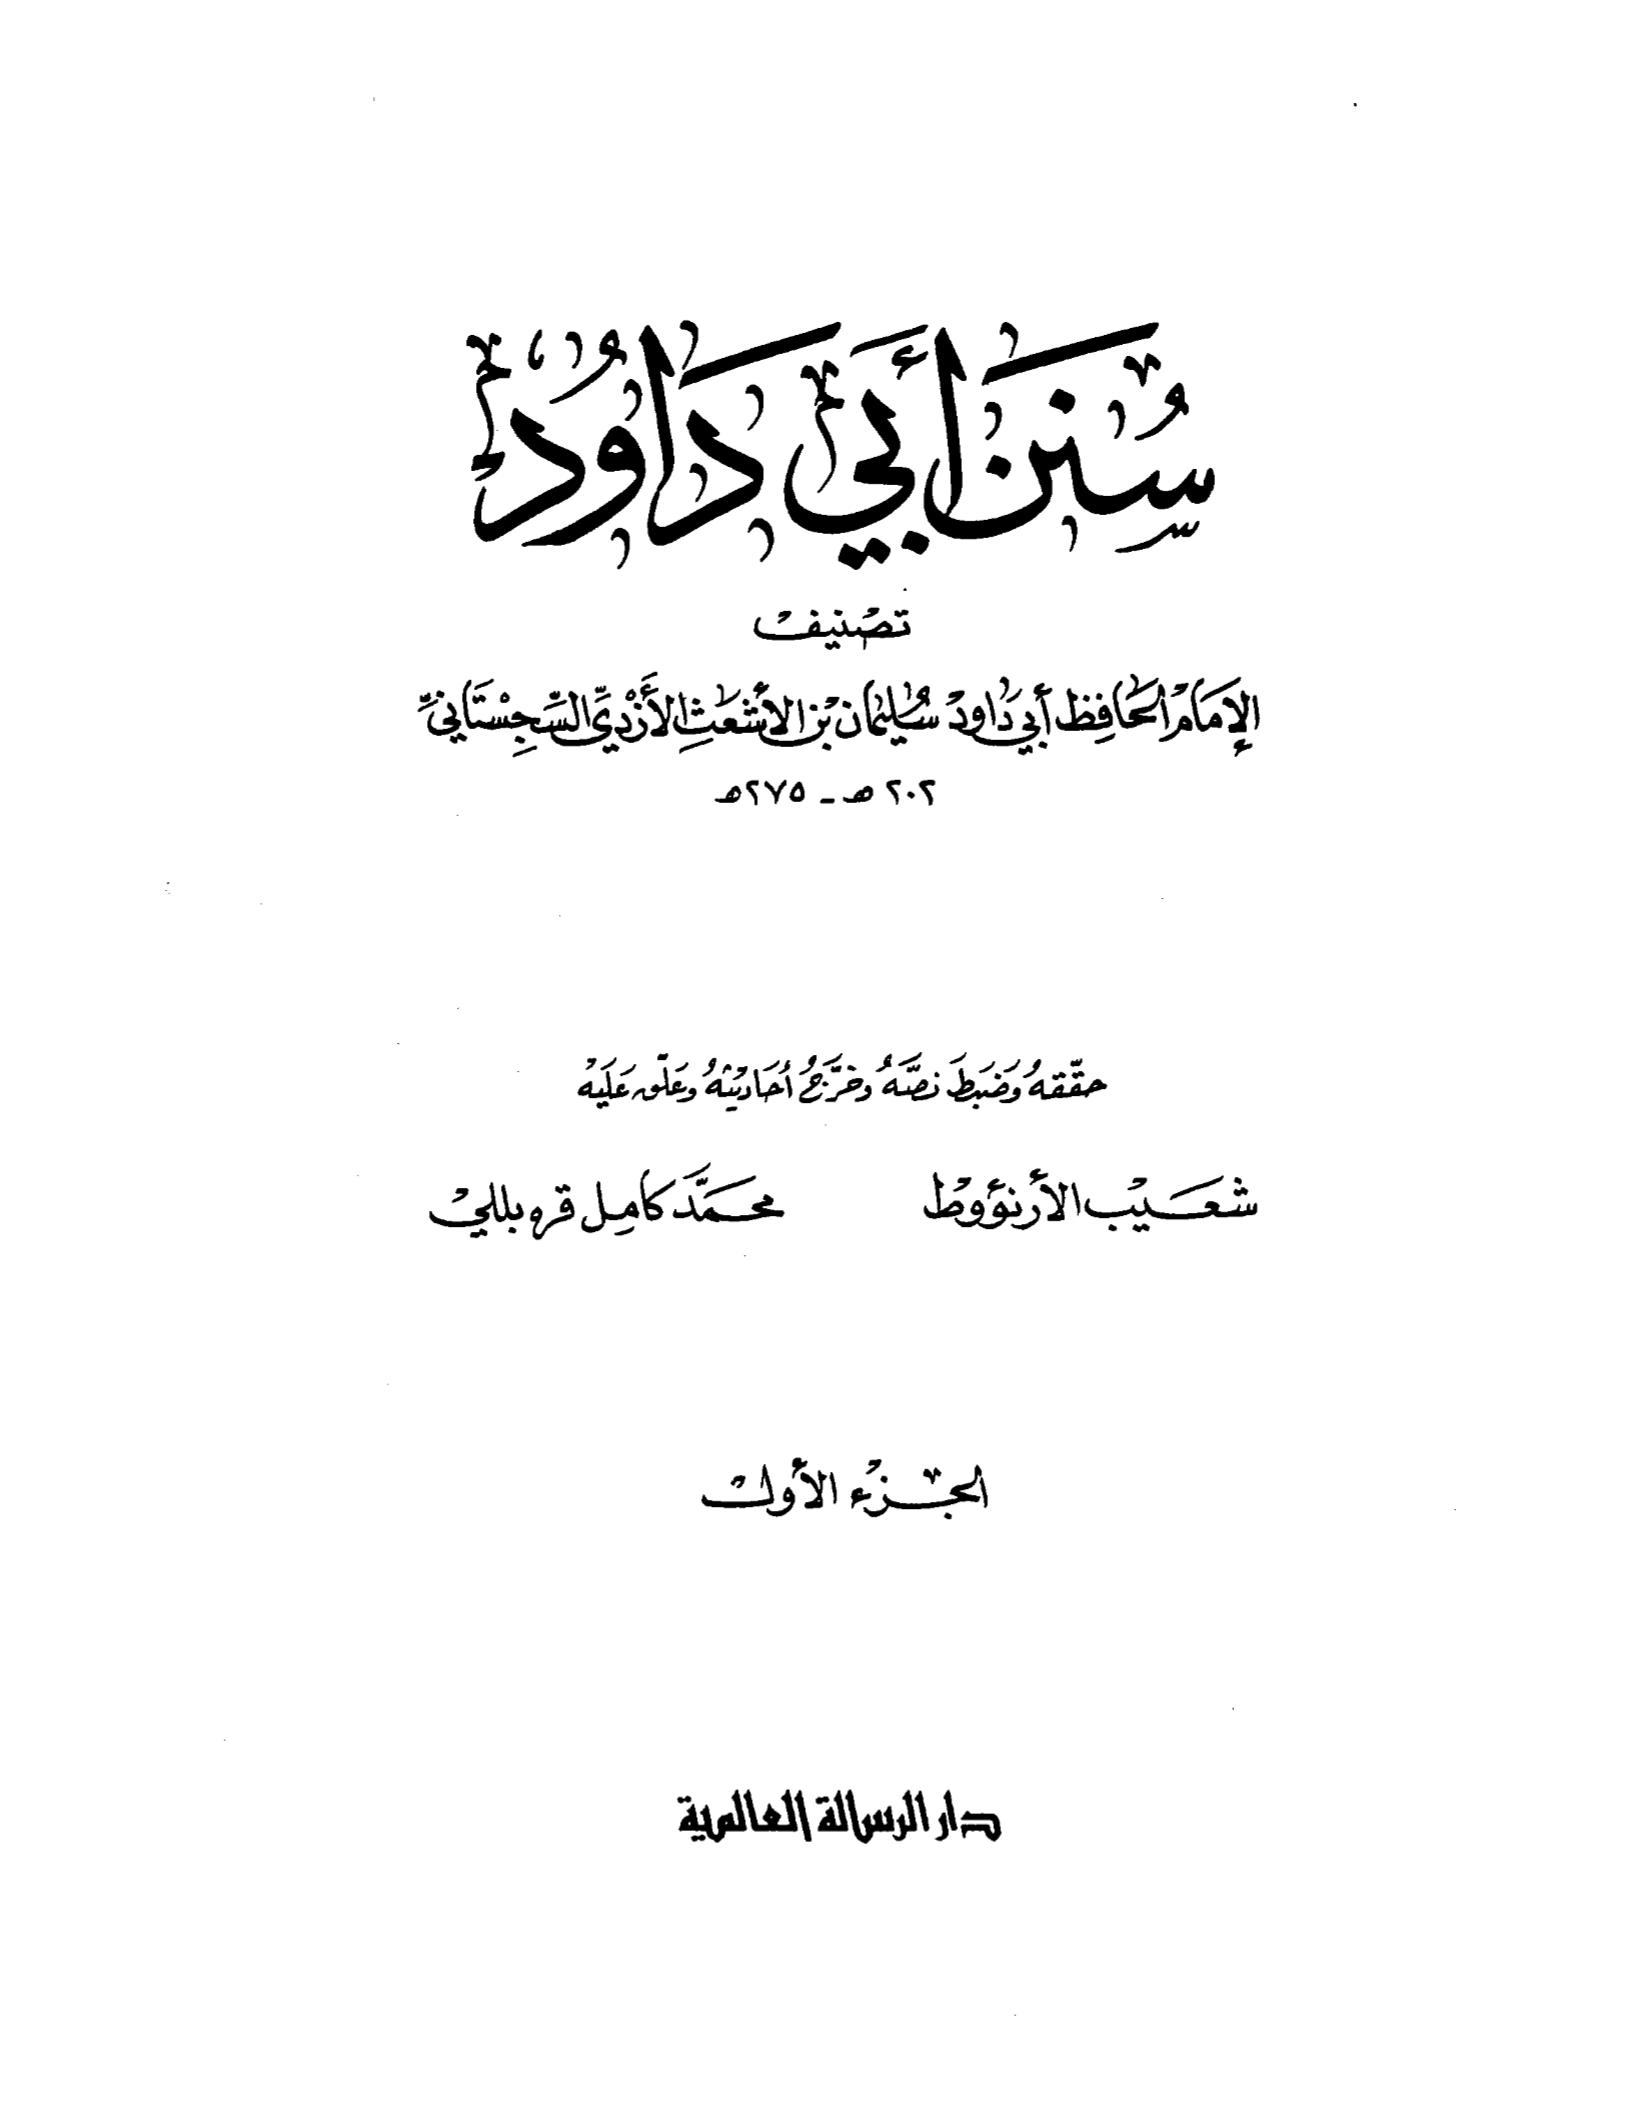 Sunan Abu Dawud al-Sijistani